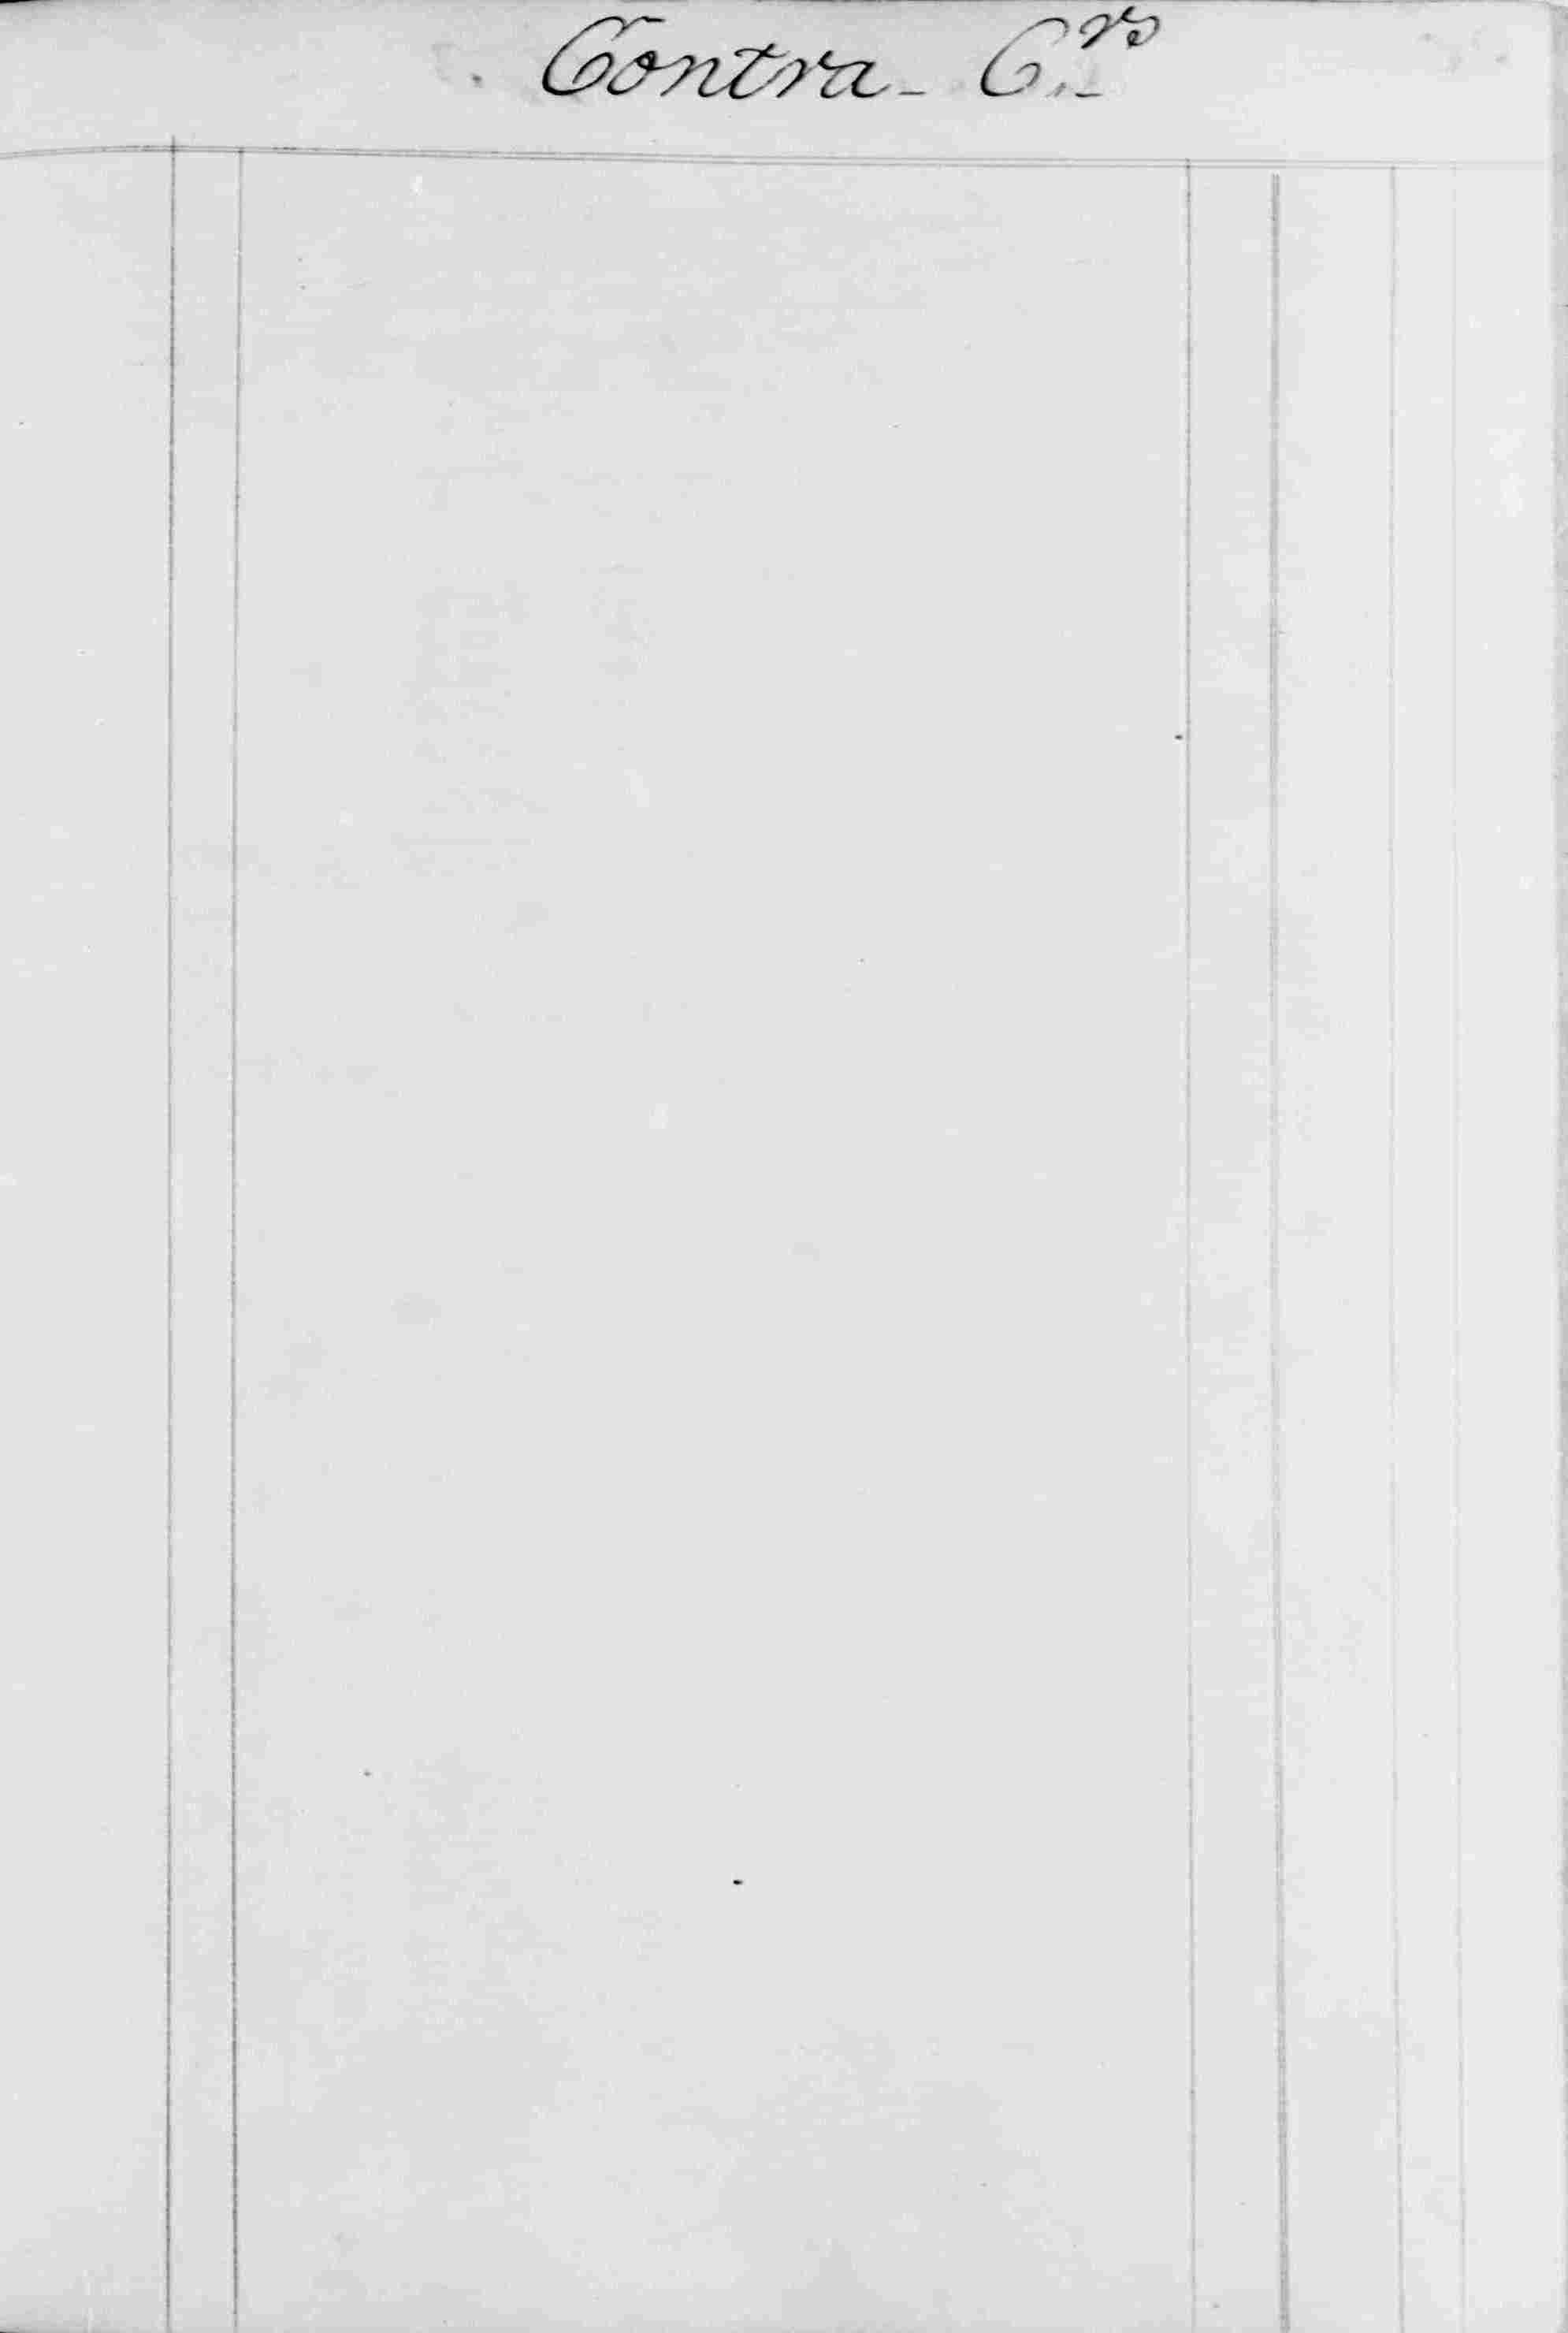 Ledger B, folio 95, right side